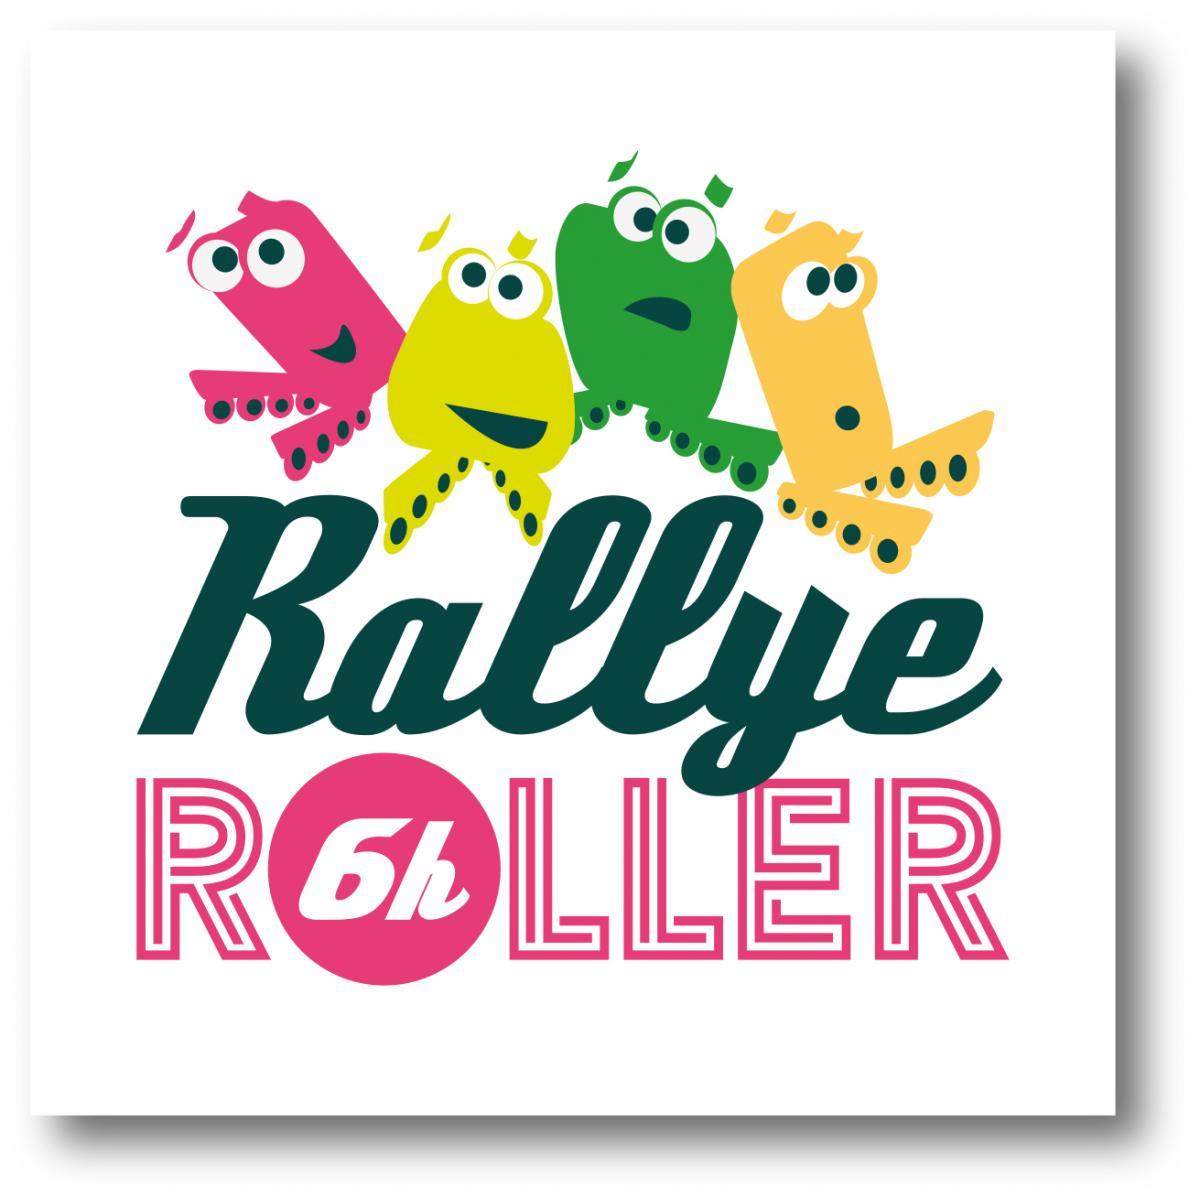 Rallye-6h-roller-carré-blanc